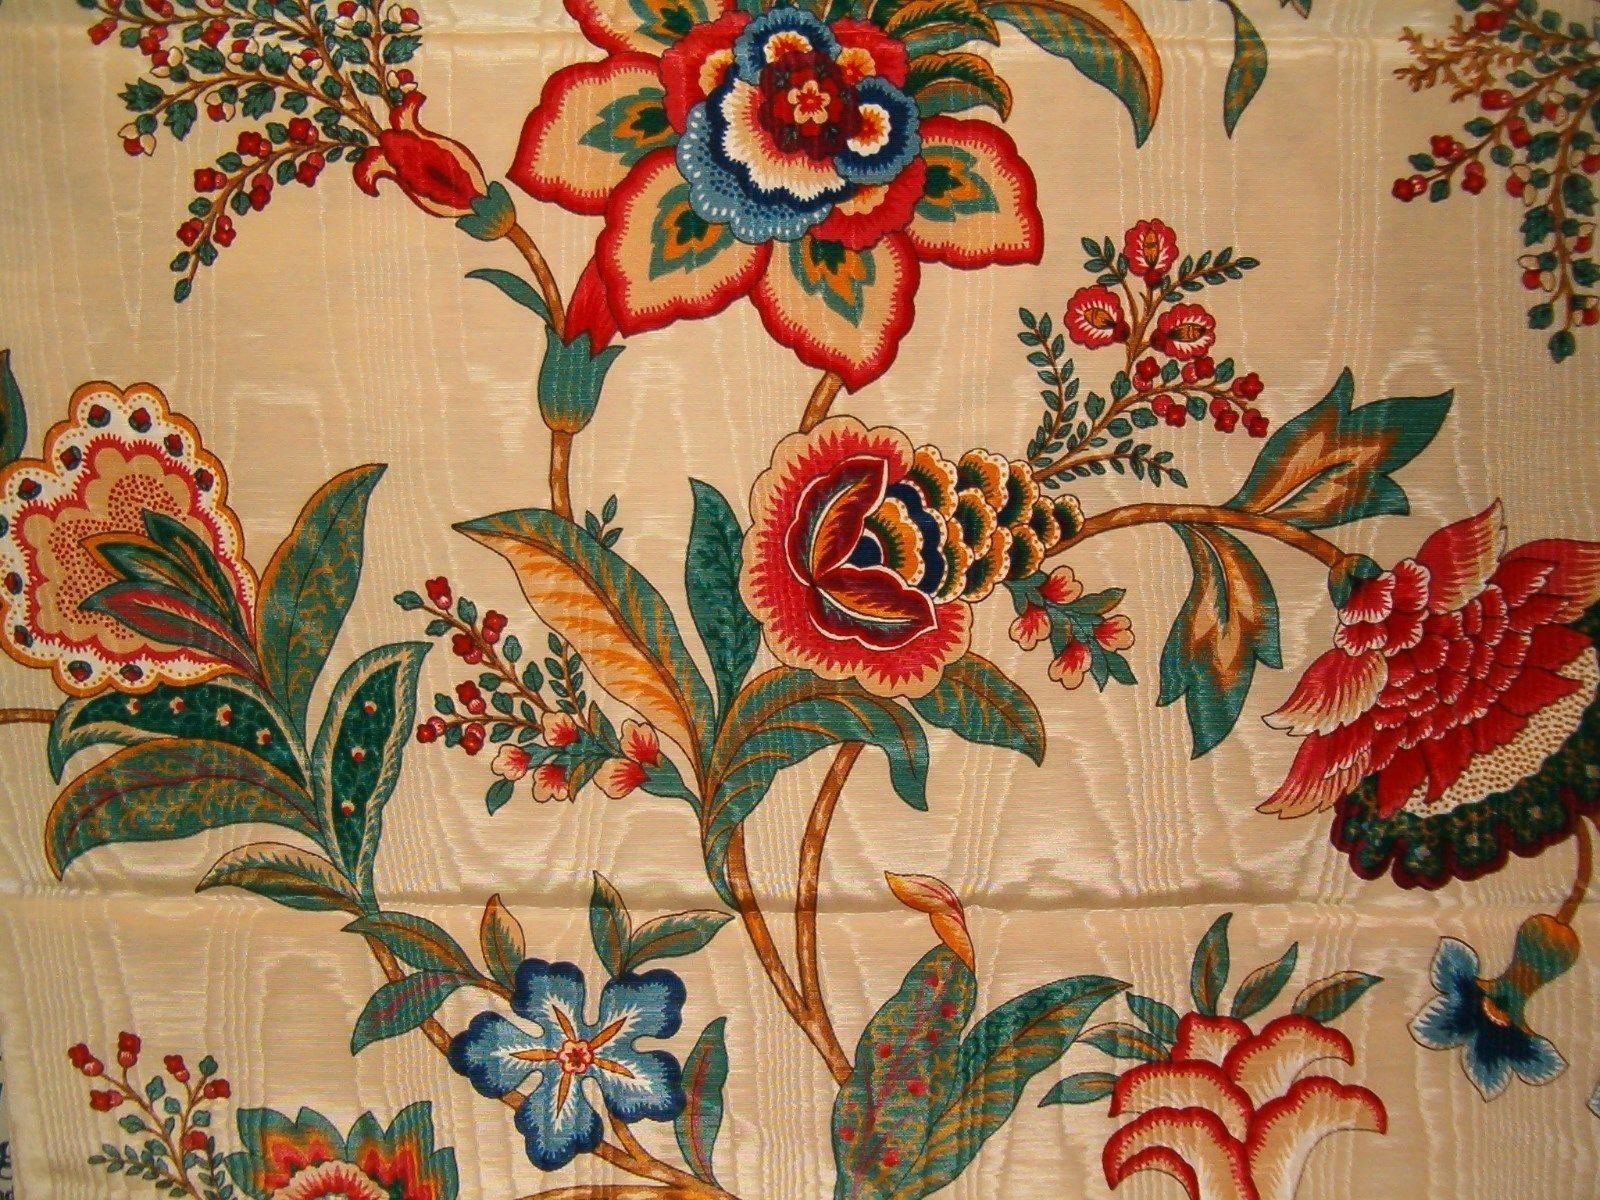 "Richloom Jacobean Floral Moire Home Decor Fabric 56"" Wide"